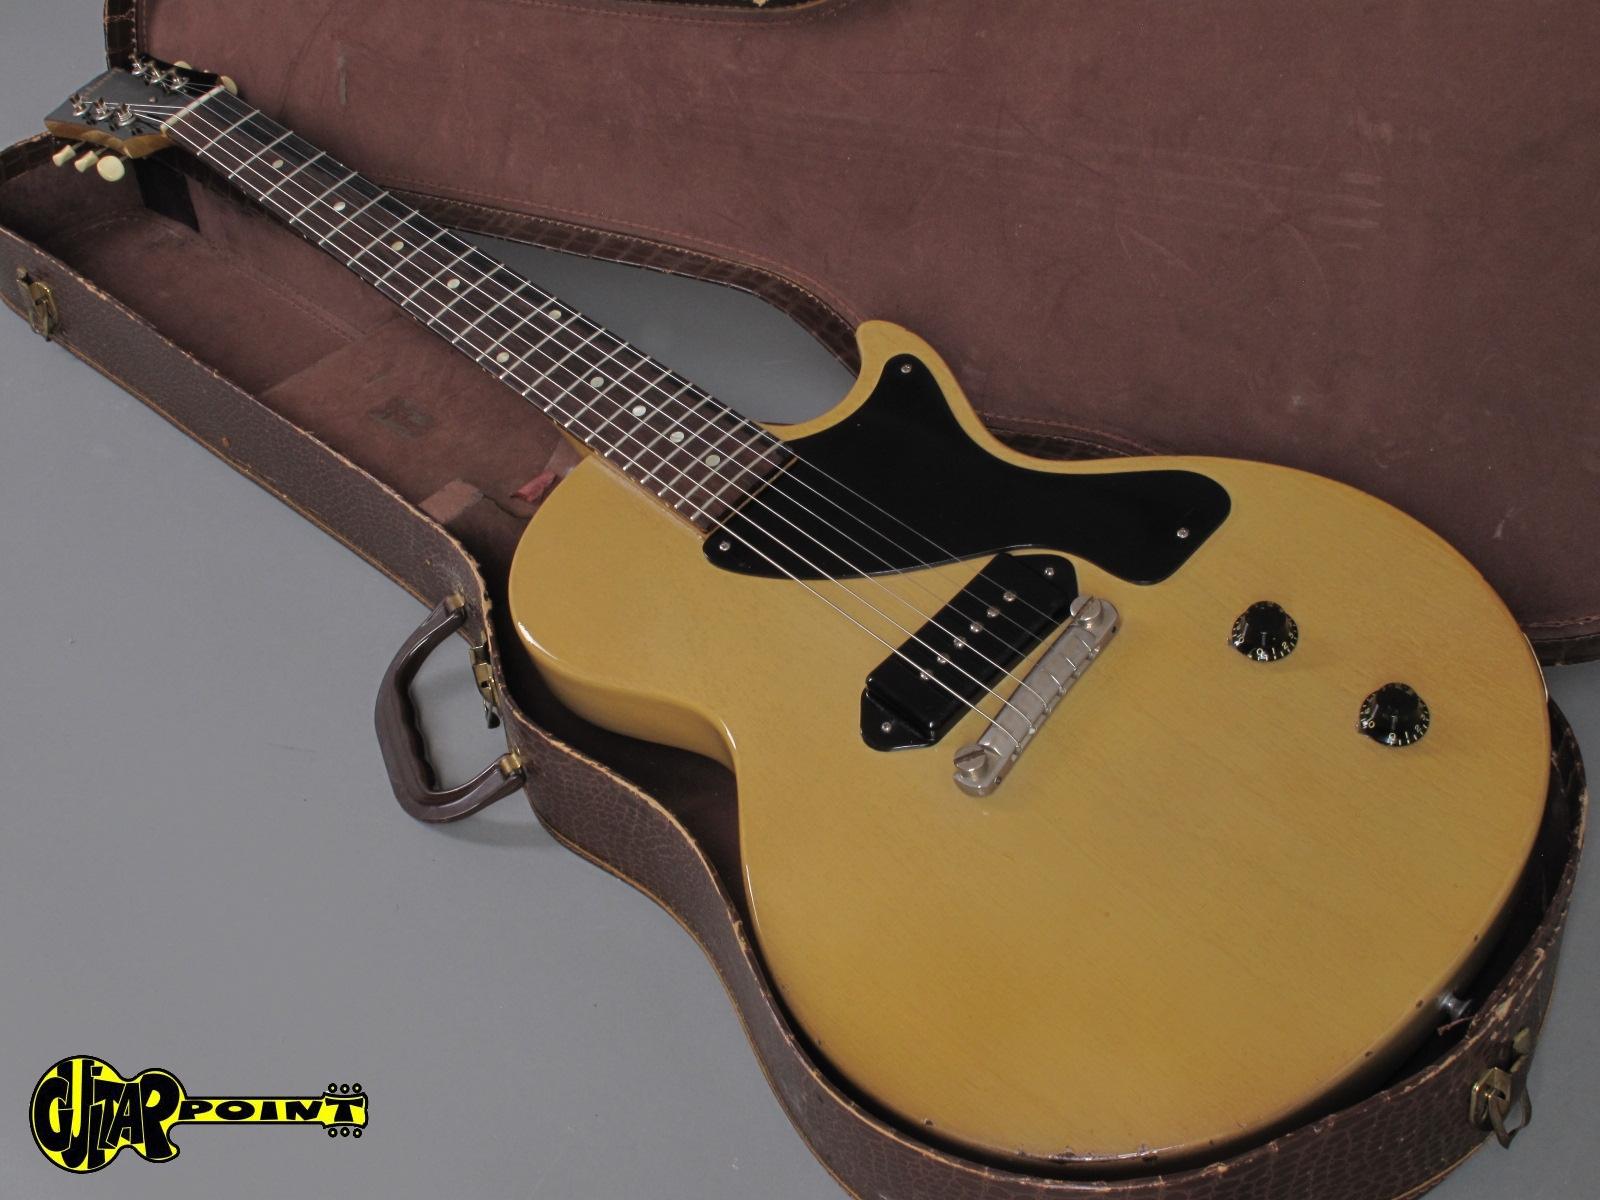 1955 Gibson Les Paul Junior Tv Yellow Vi55gilpjuntv511786